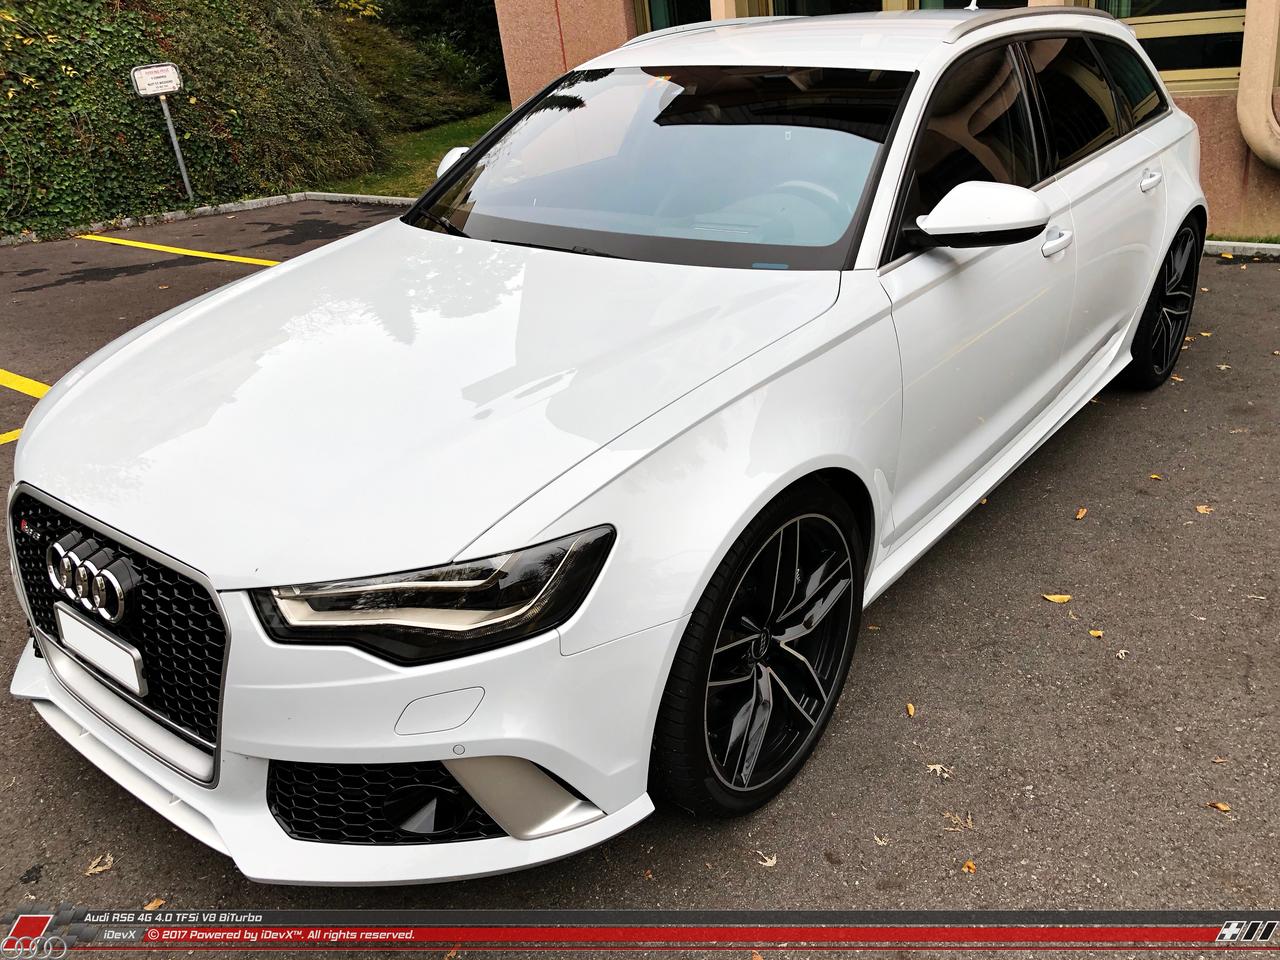 10_11.2018_Audi-RS6_iDevX_021.png